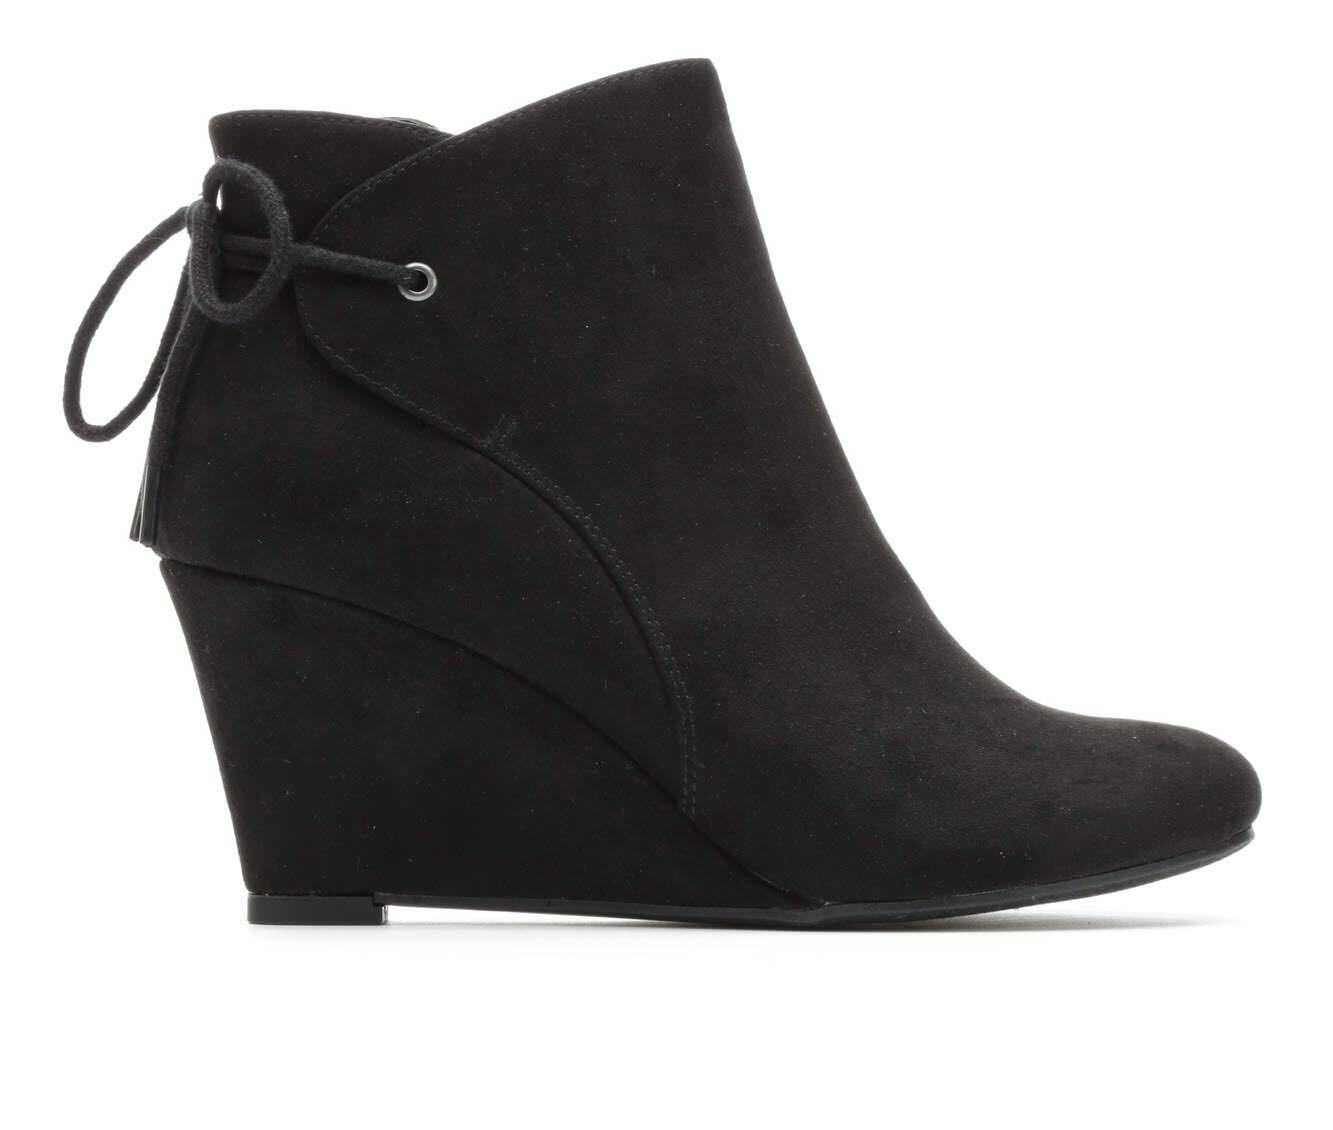 Black Wedge Heel Shoes hHRJsA4j